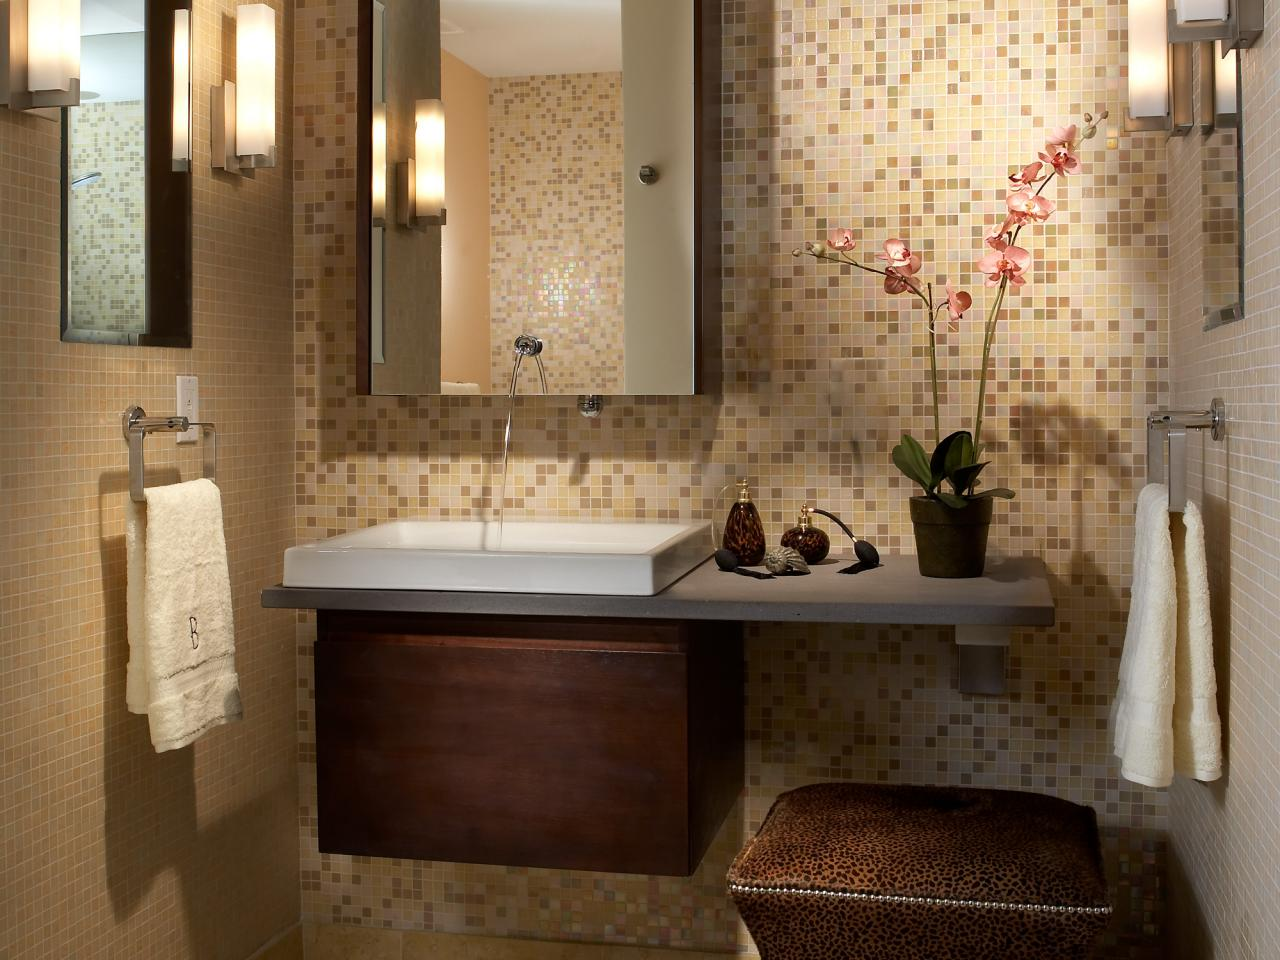 بالصور ديكور حمامات صغيرة , اجمل اشكال حمامات صغيرة الحجم لمنزل عروس